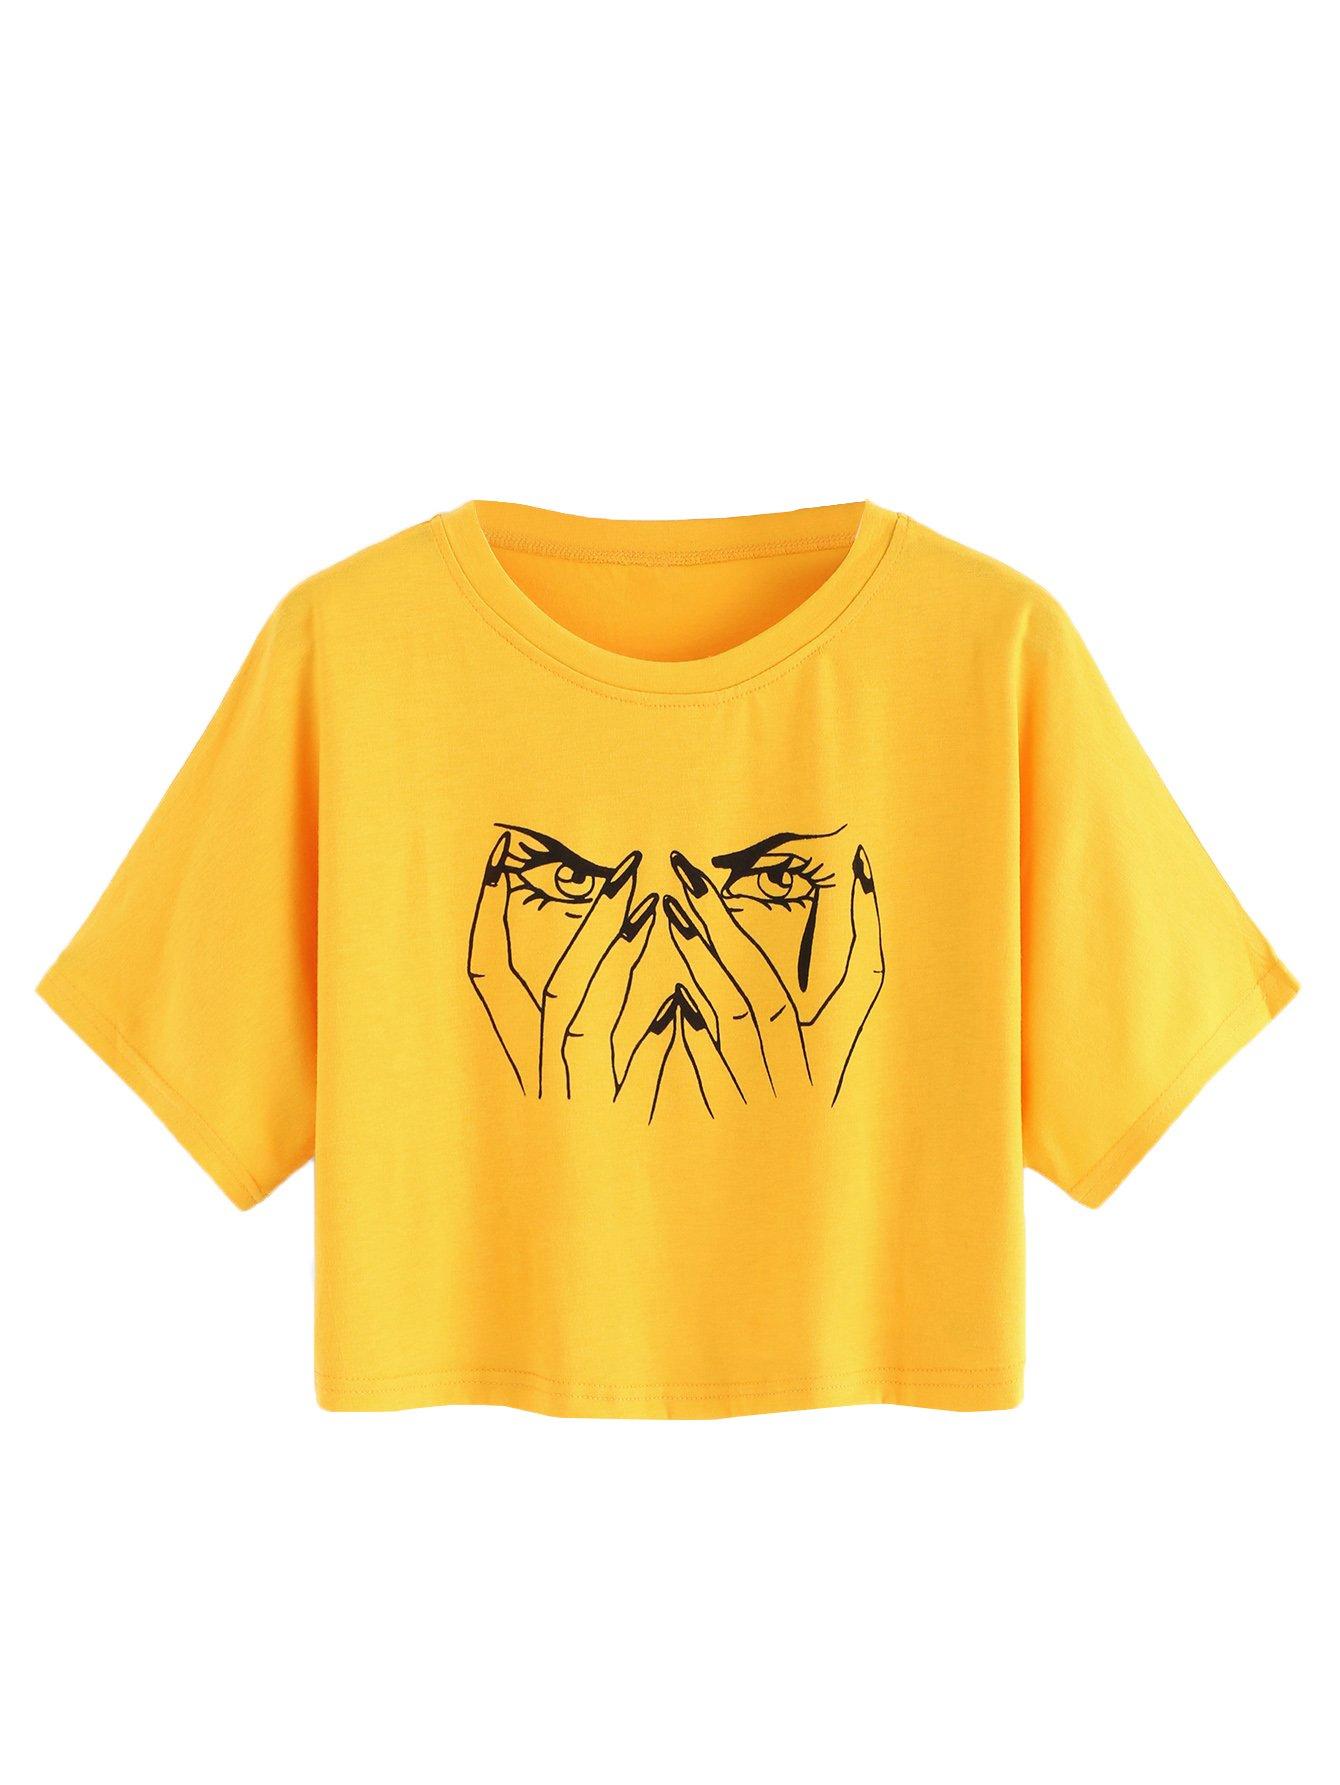 SweatyRocks Women's Loose Summer Short Sleeve Graphic Print Crop Top T-Shirt Yellow L